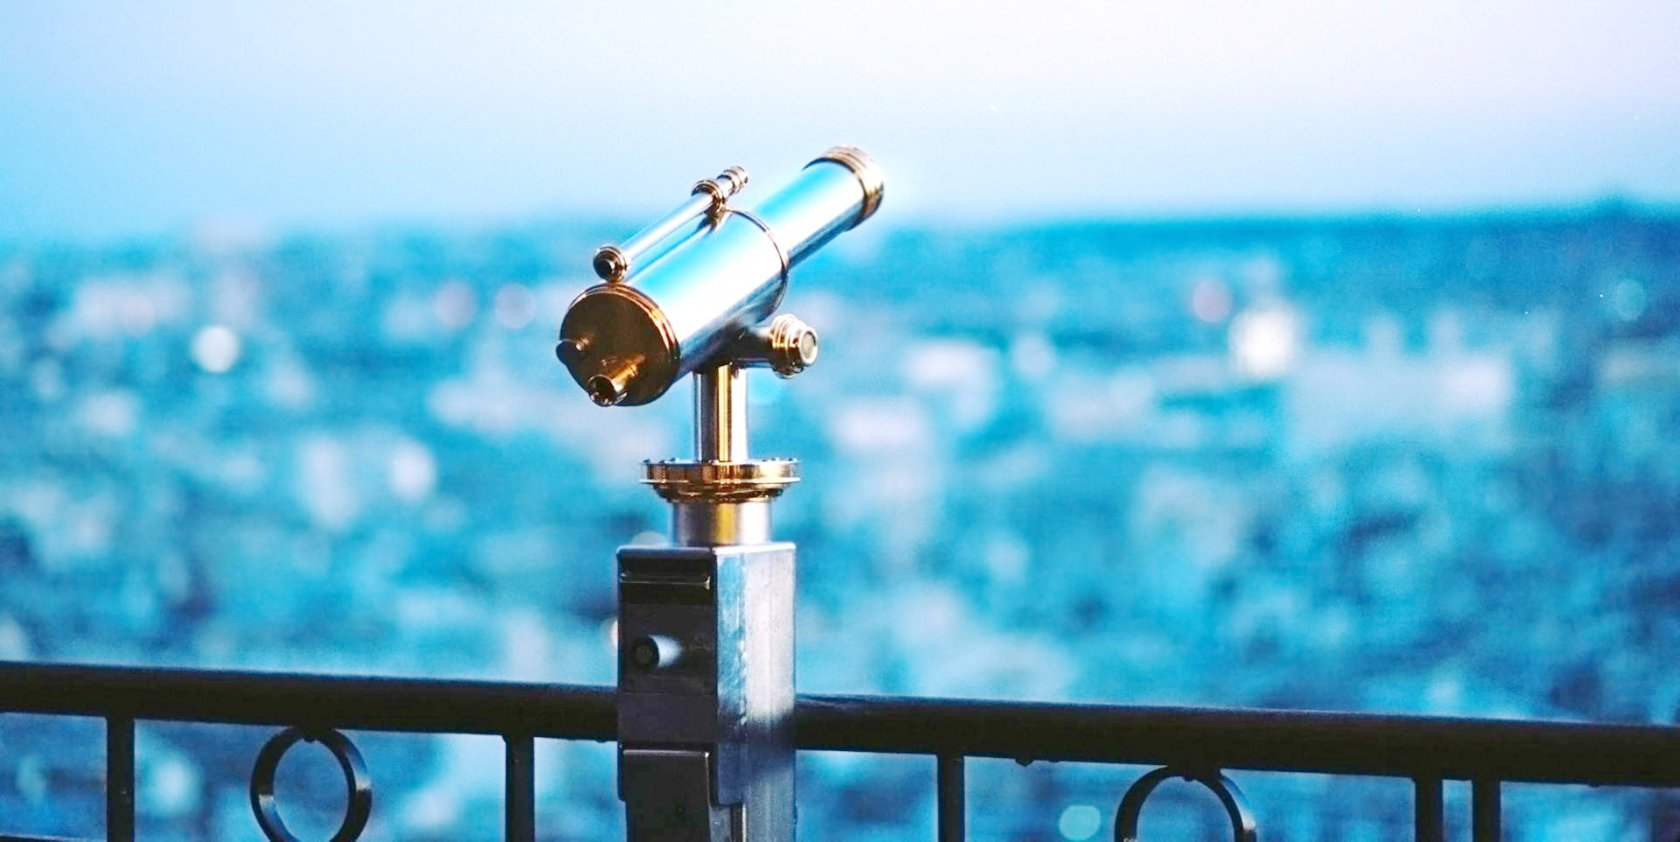 teleskop_gorod_vecher_vid_sooruzhenie_19